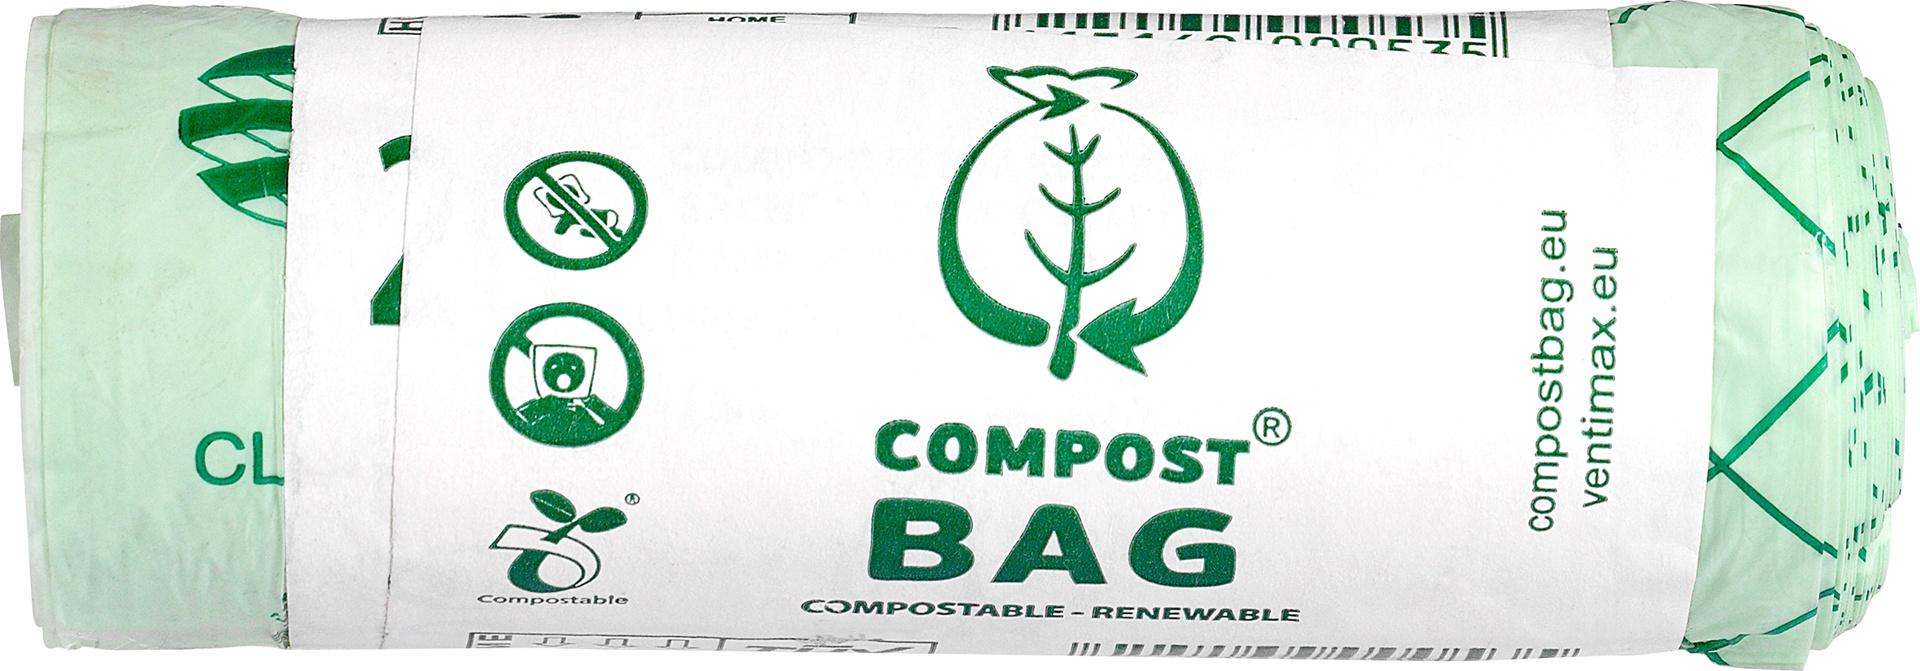 Biologische Compost Bag Afvalzak 10L composteerbaar 1 st